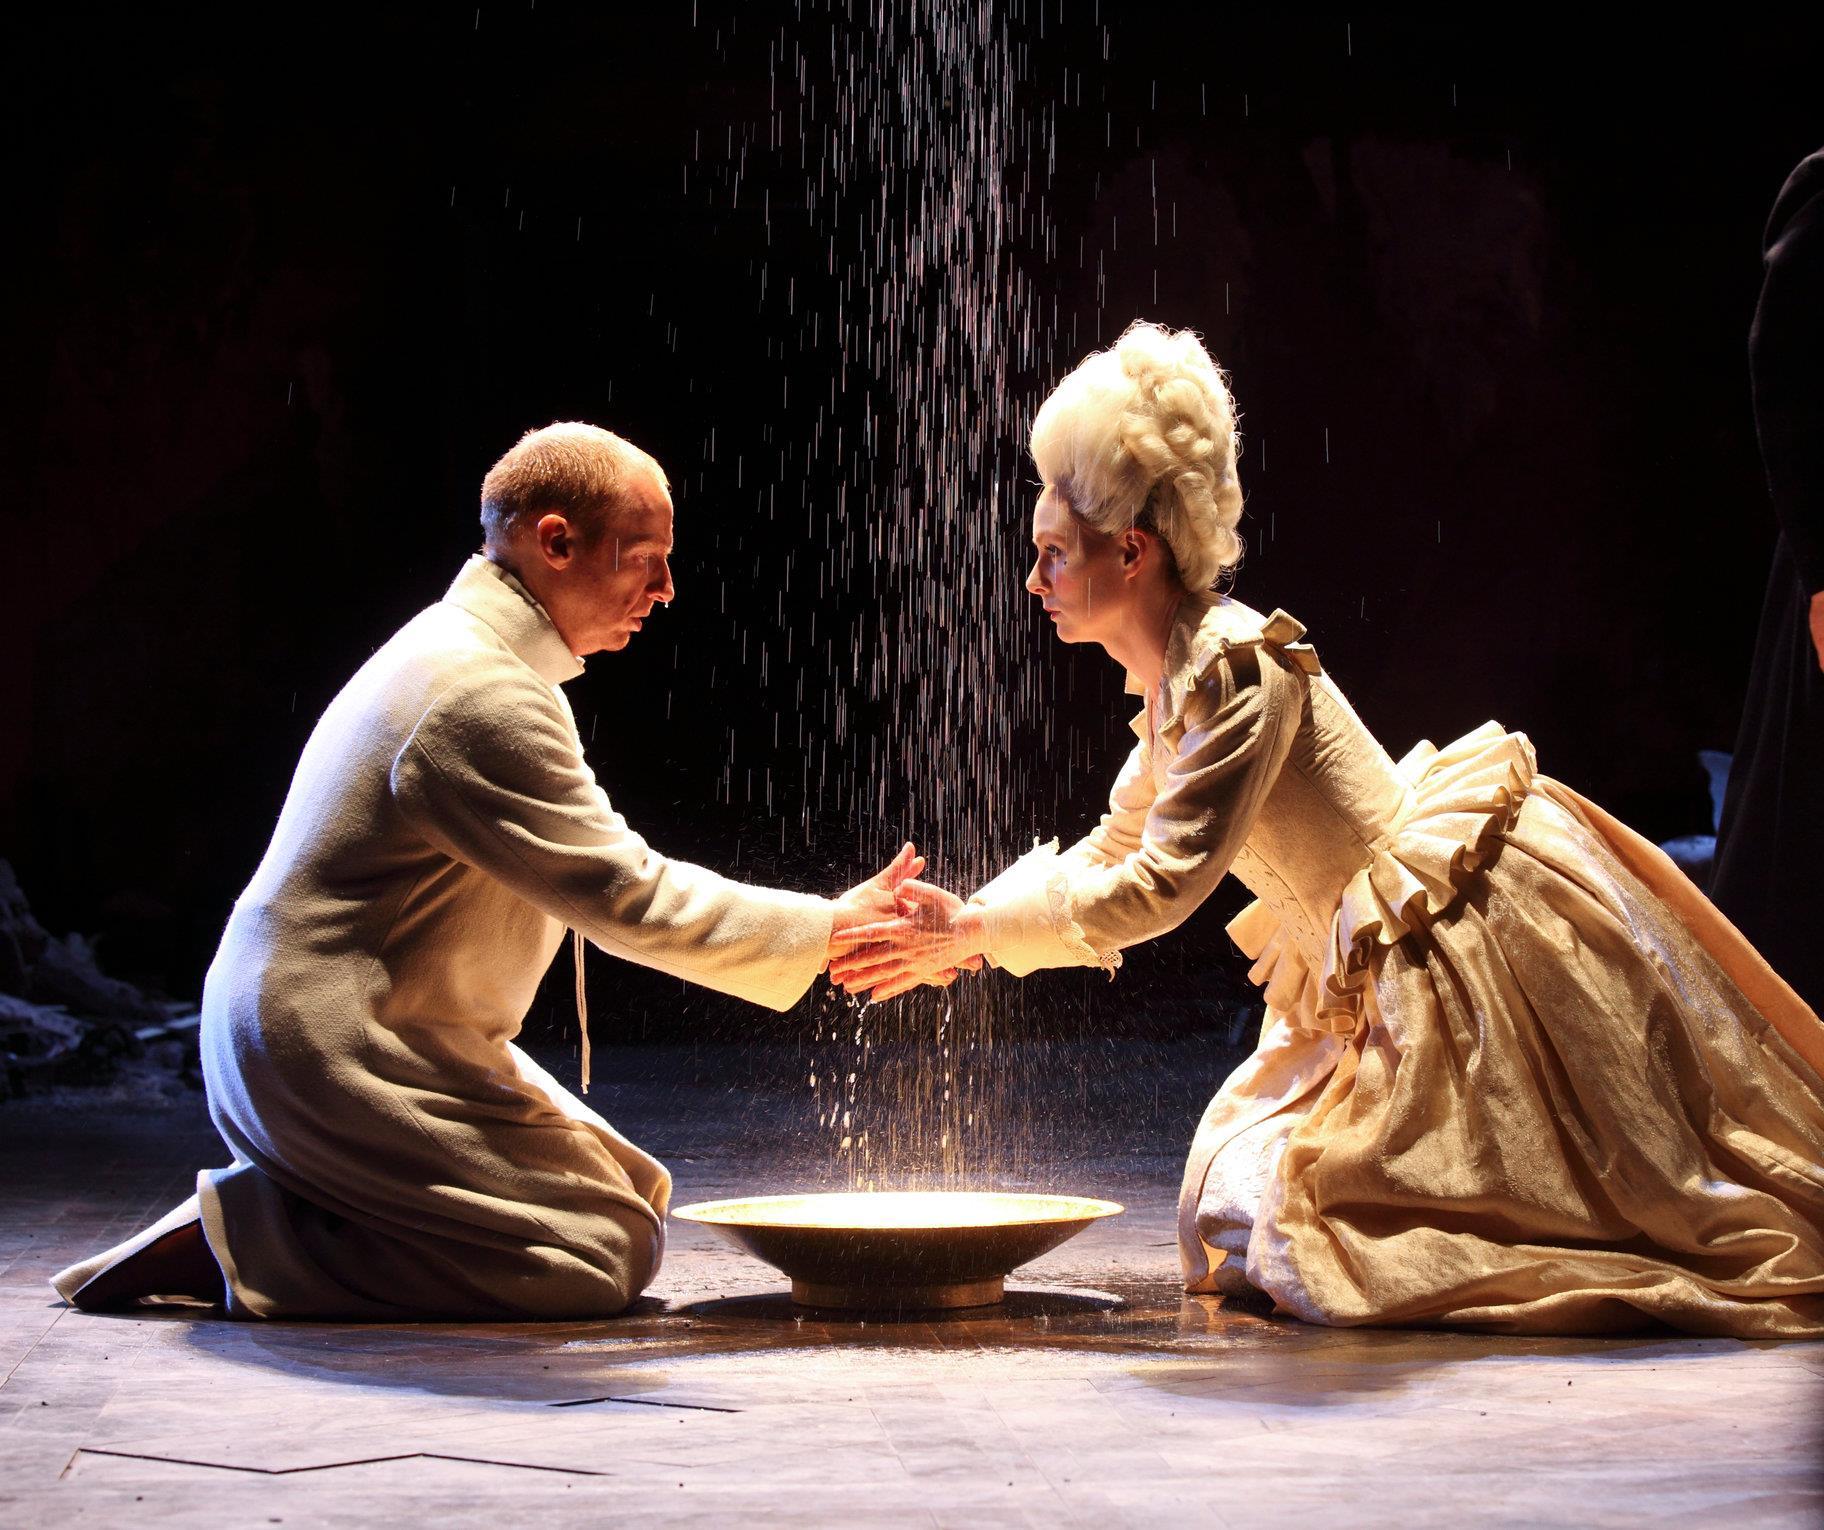 Macbeth and Lady Macbeth perform a coronation ritual.